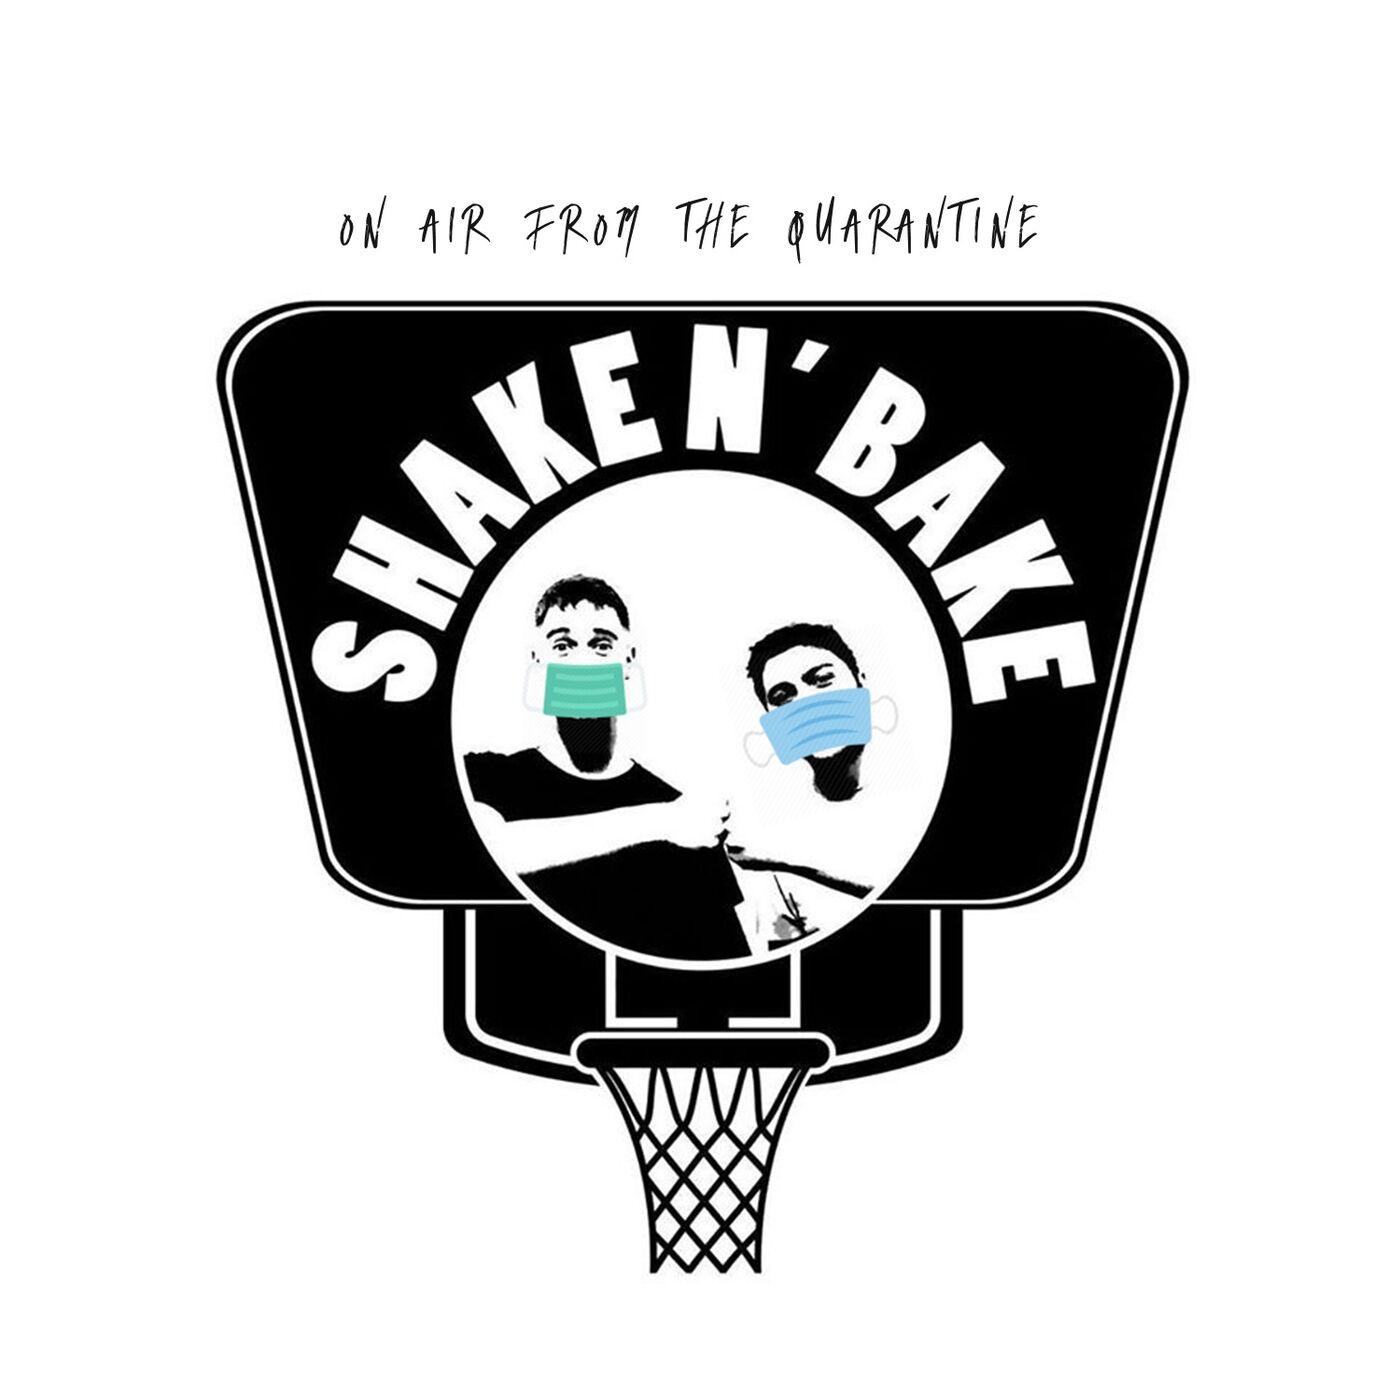 Shake n' Bake: S05E17 - ON AIR from the quarantine